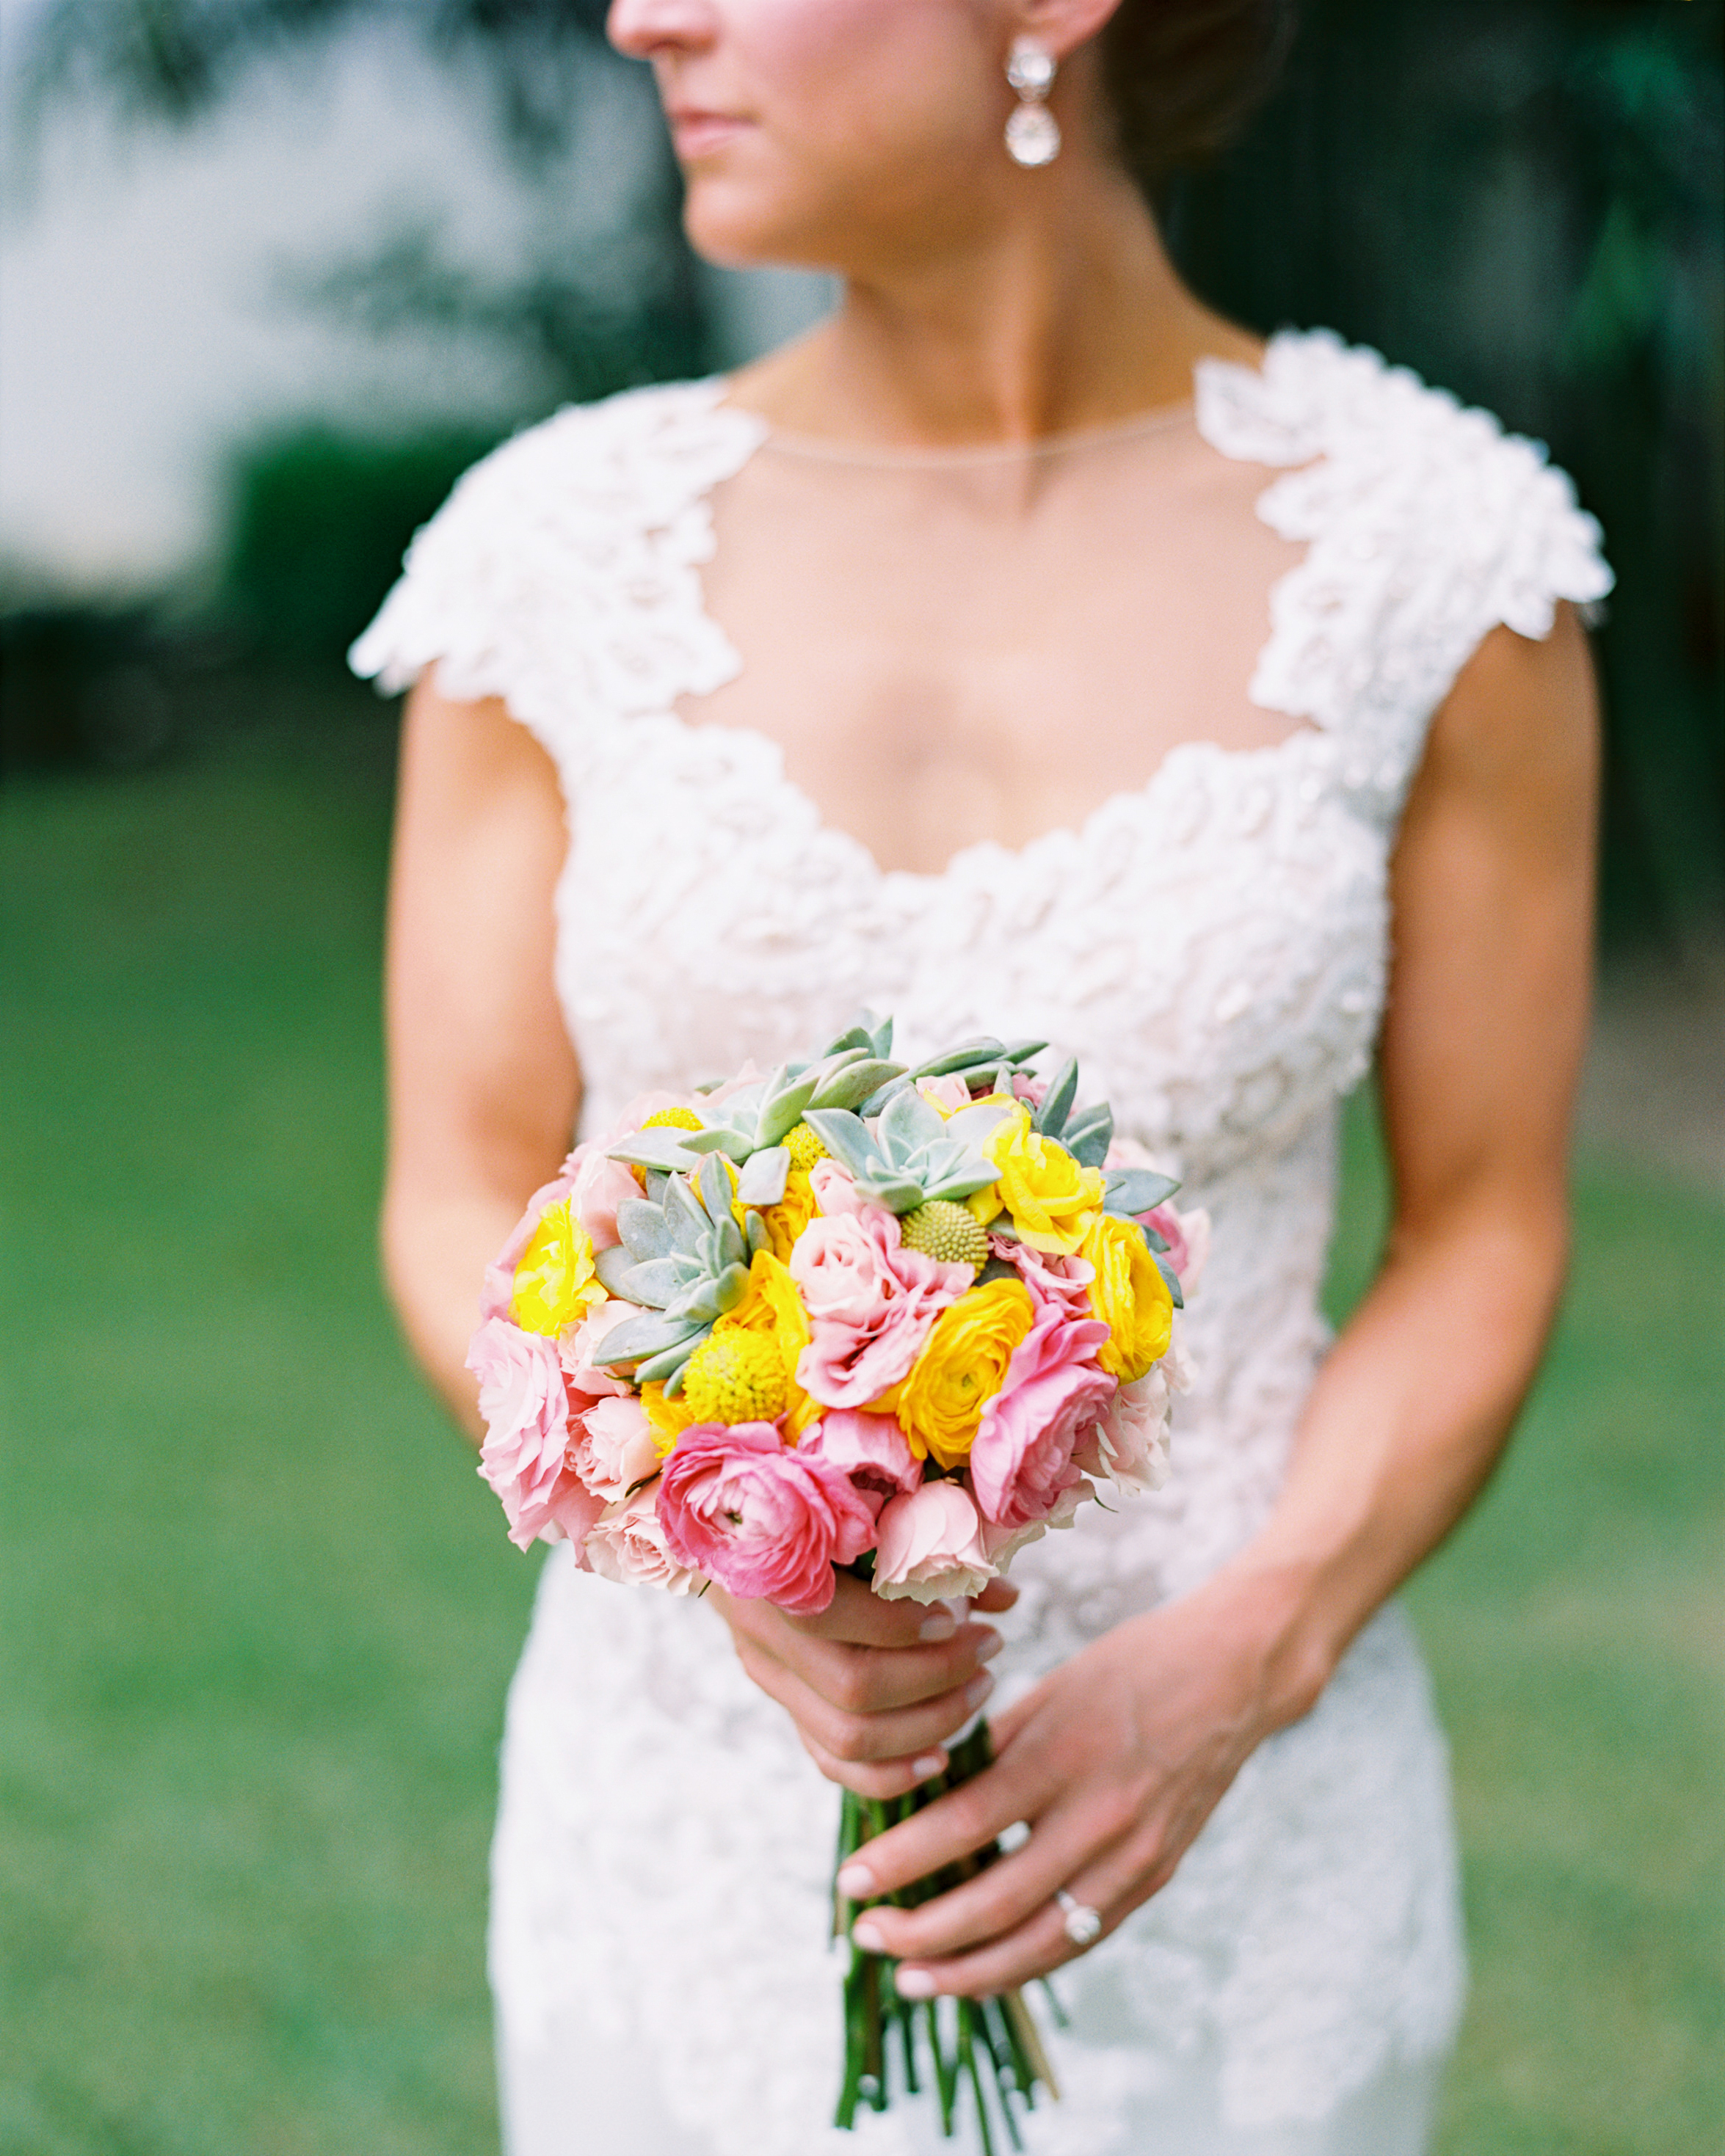 molly-nate-wedding-bouquet-096-s111479-0814.jpg